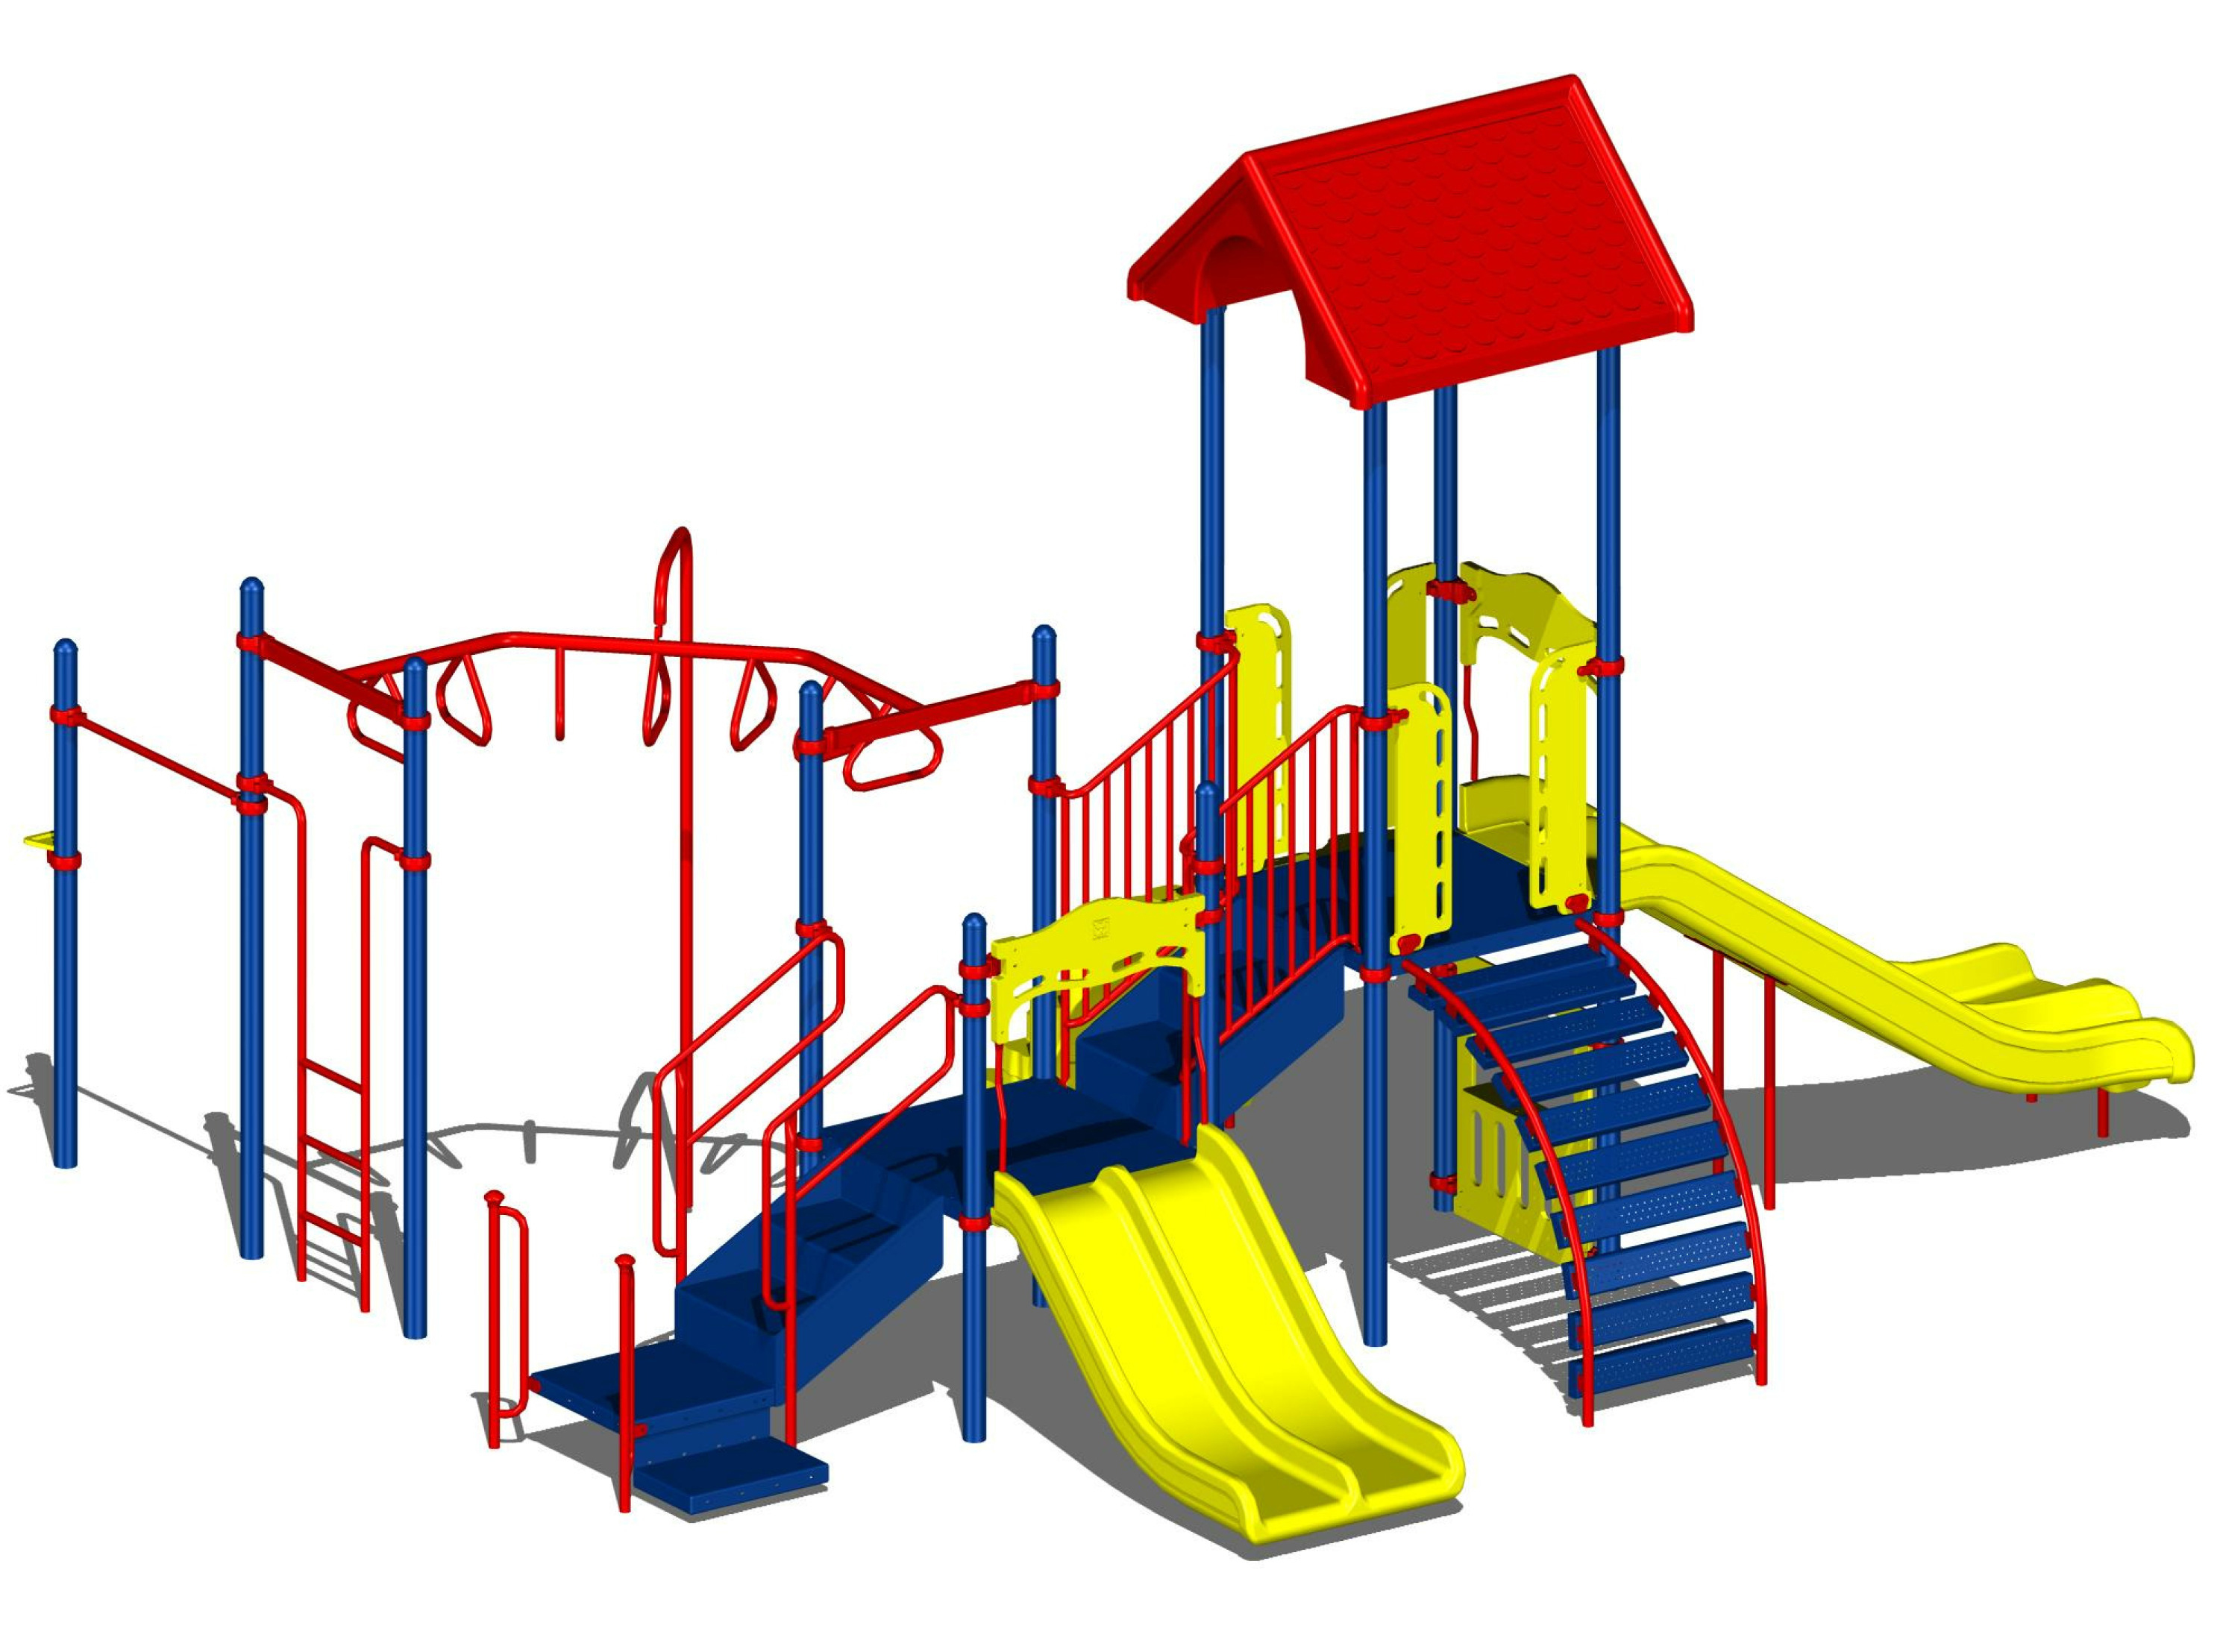 2980x2215 Cartoon Playground Clipart